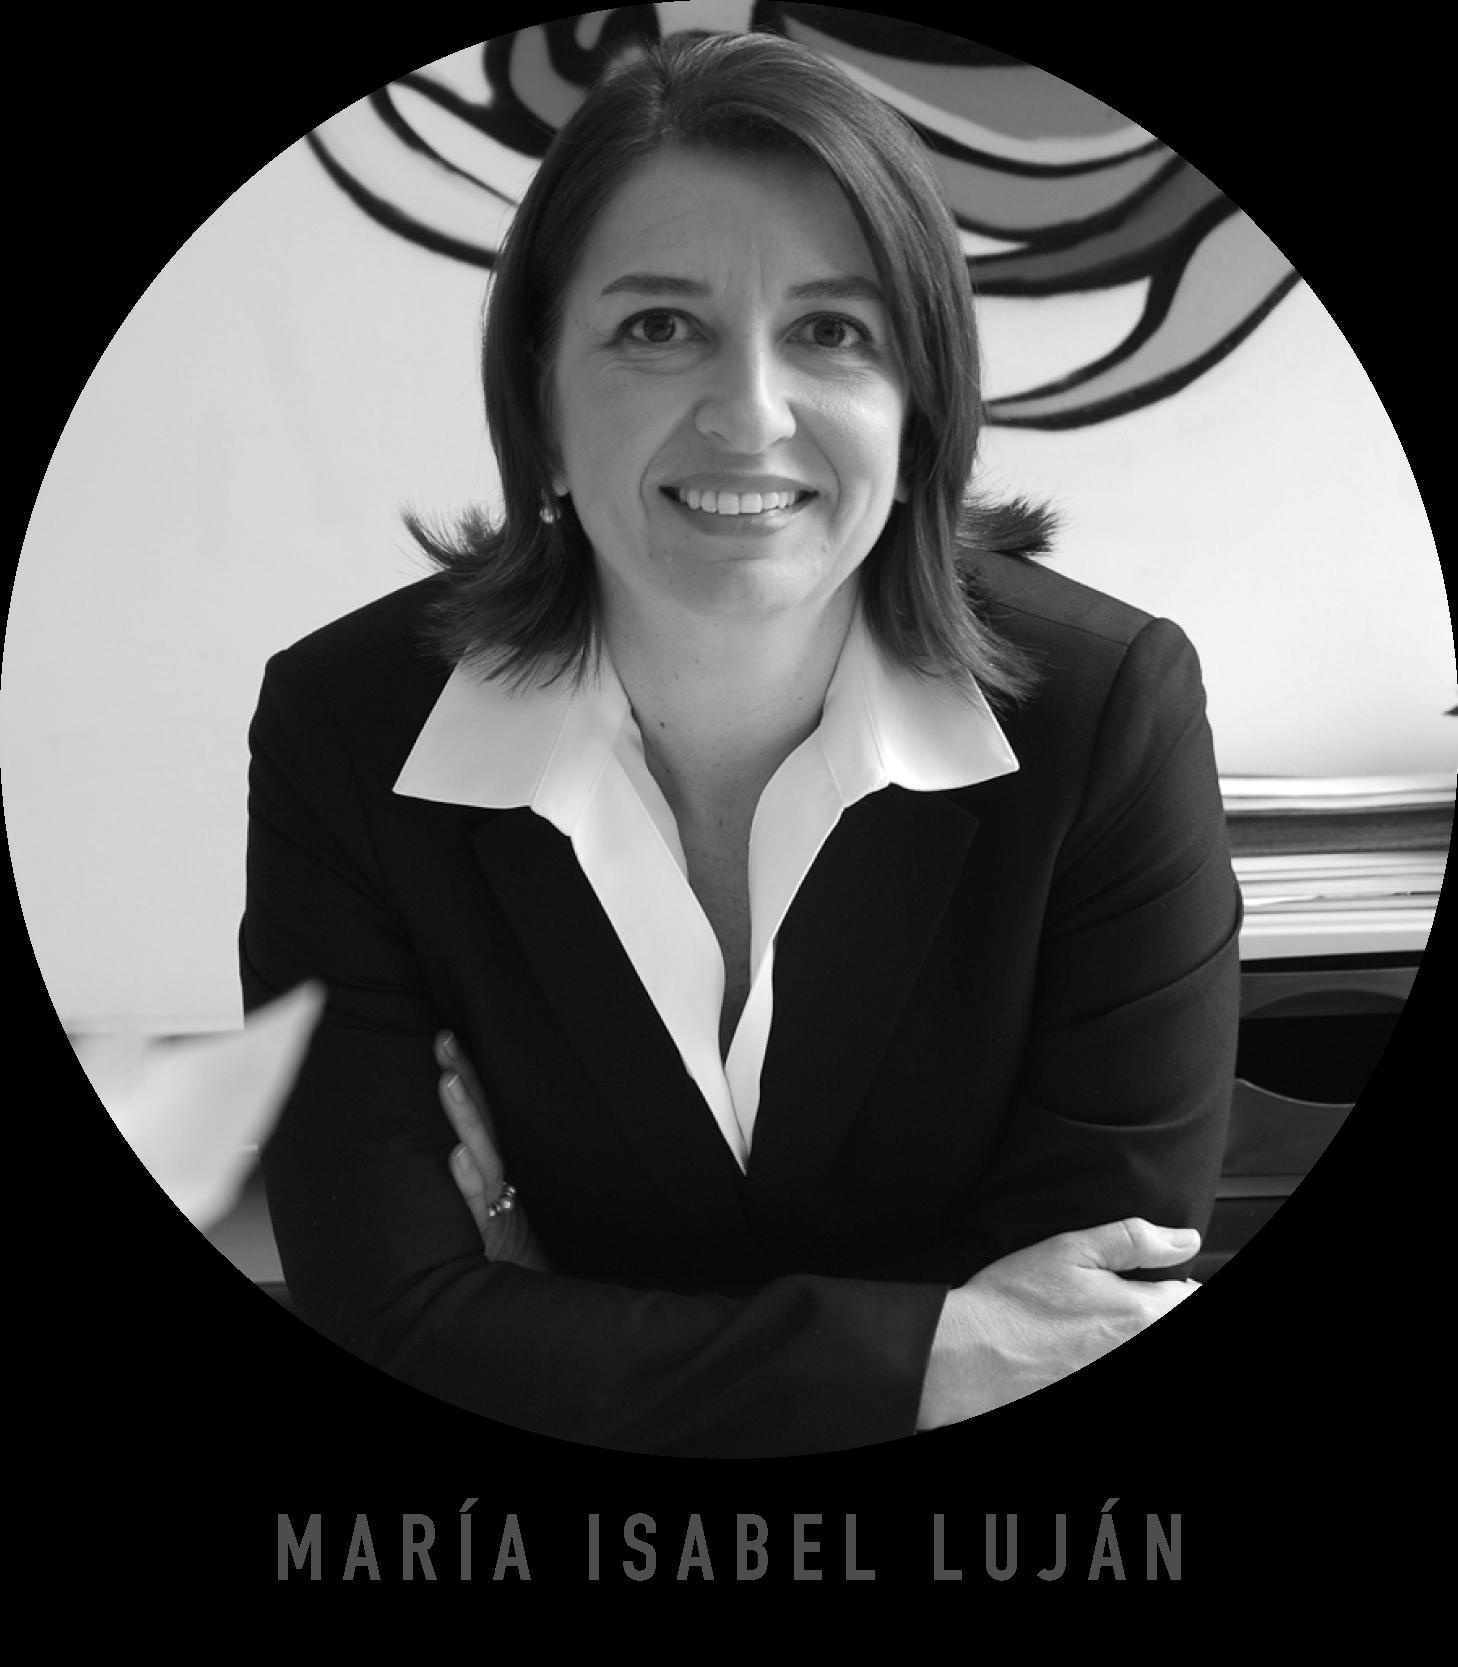 MARIA_ISABEL_LUJAN.png